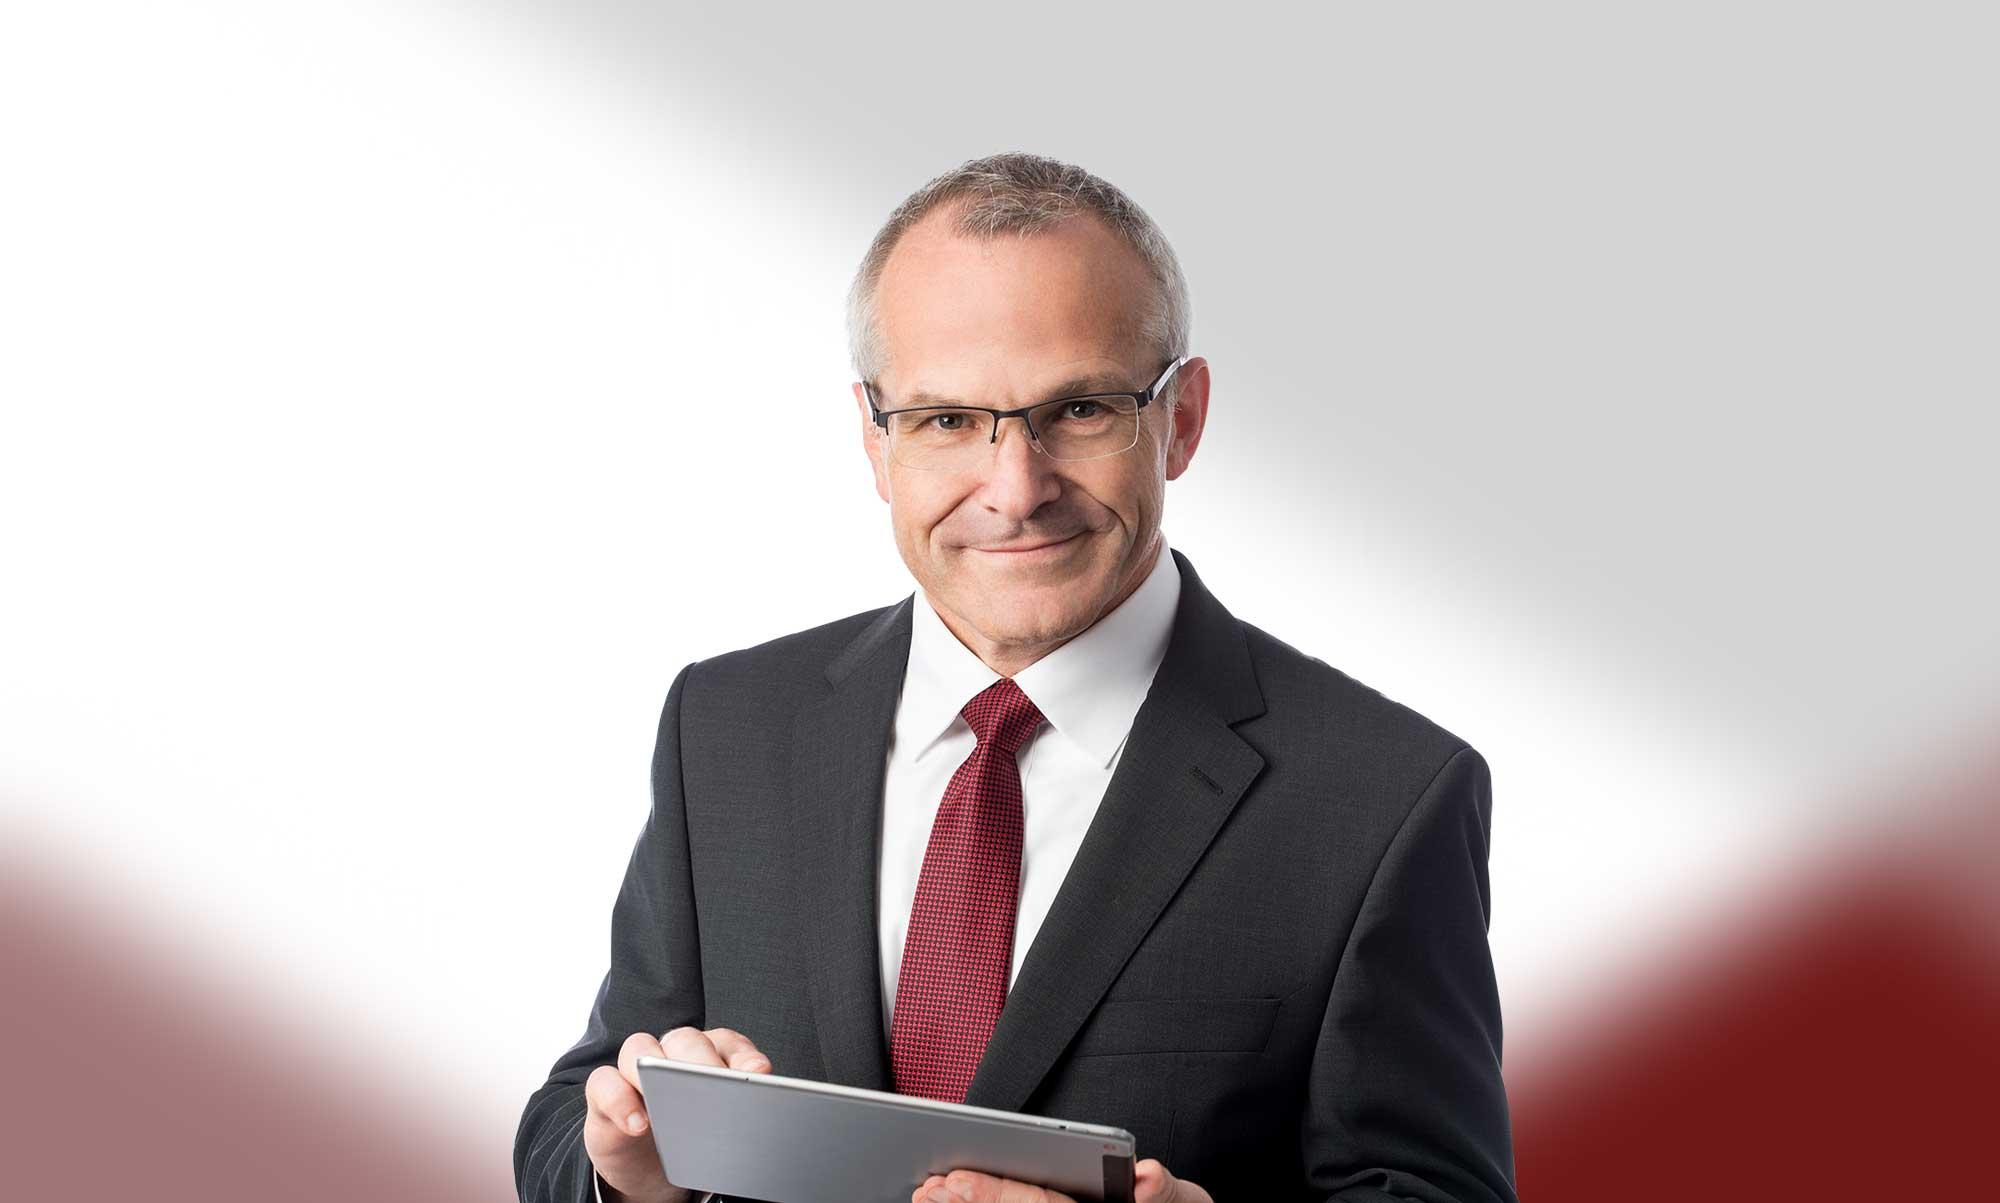 Prof. Dr. Martin Selchert